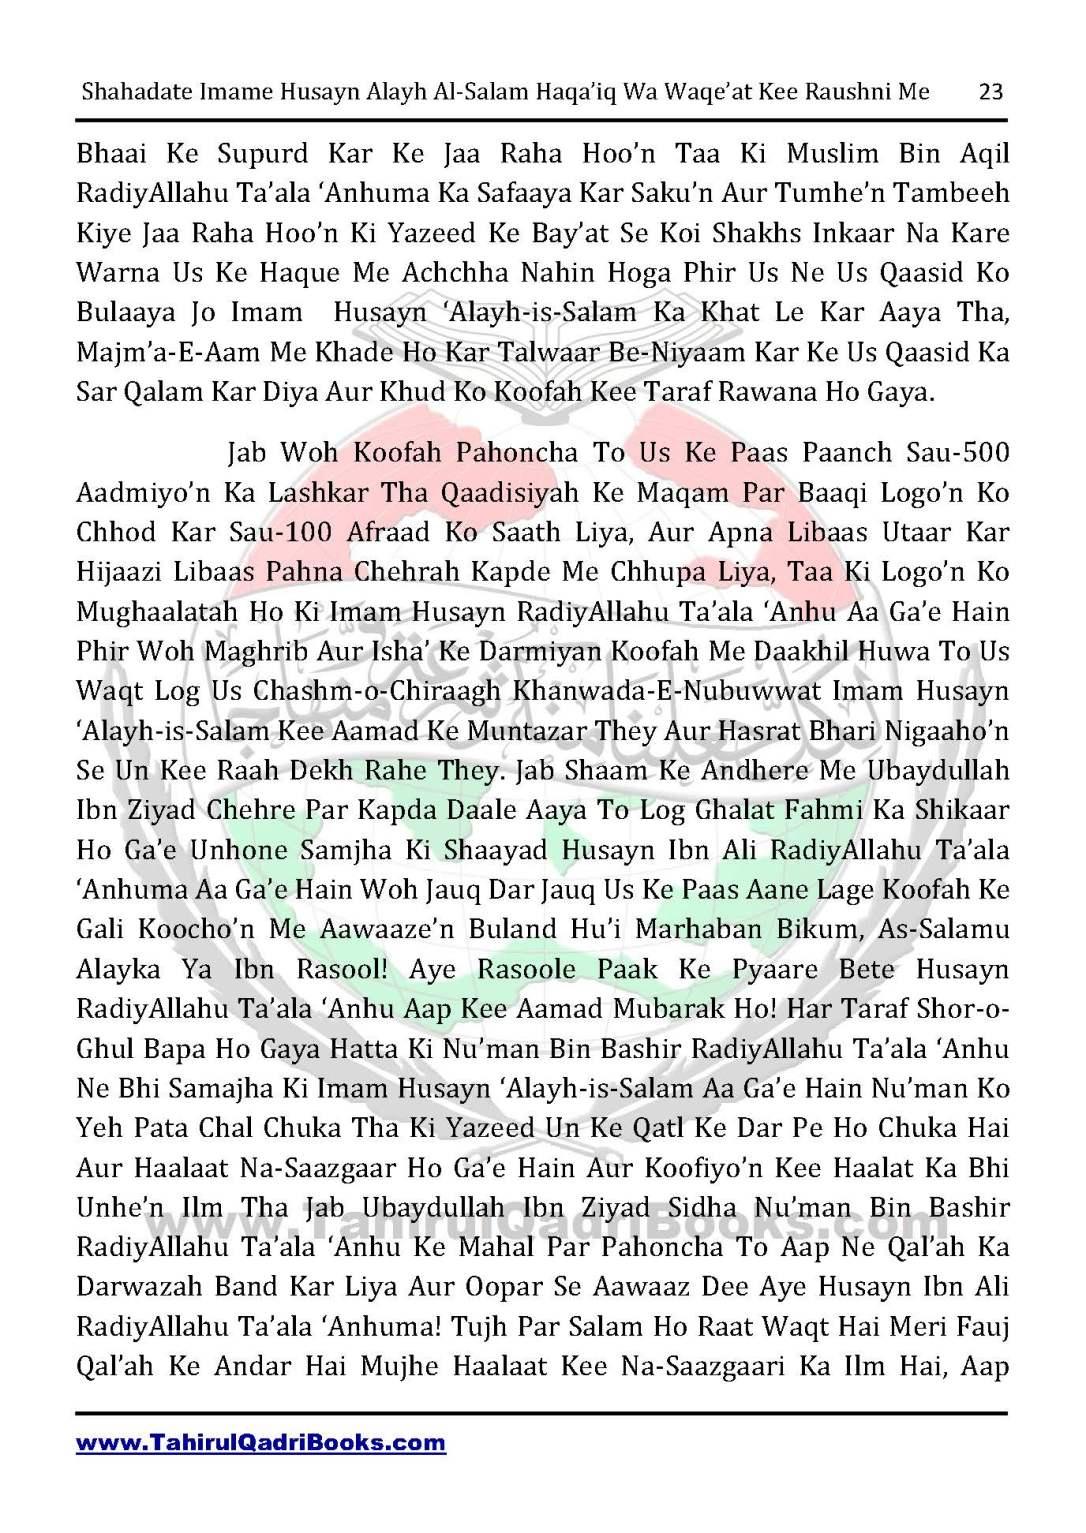 shahadate-imame-husayn-alayh-is-salam-haqaiq-wa-waqe_at-kee-raushni-me-in-roman-urdu-unlocked_Page_23